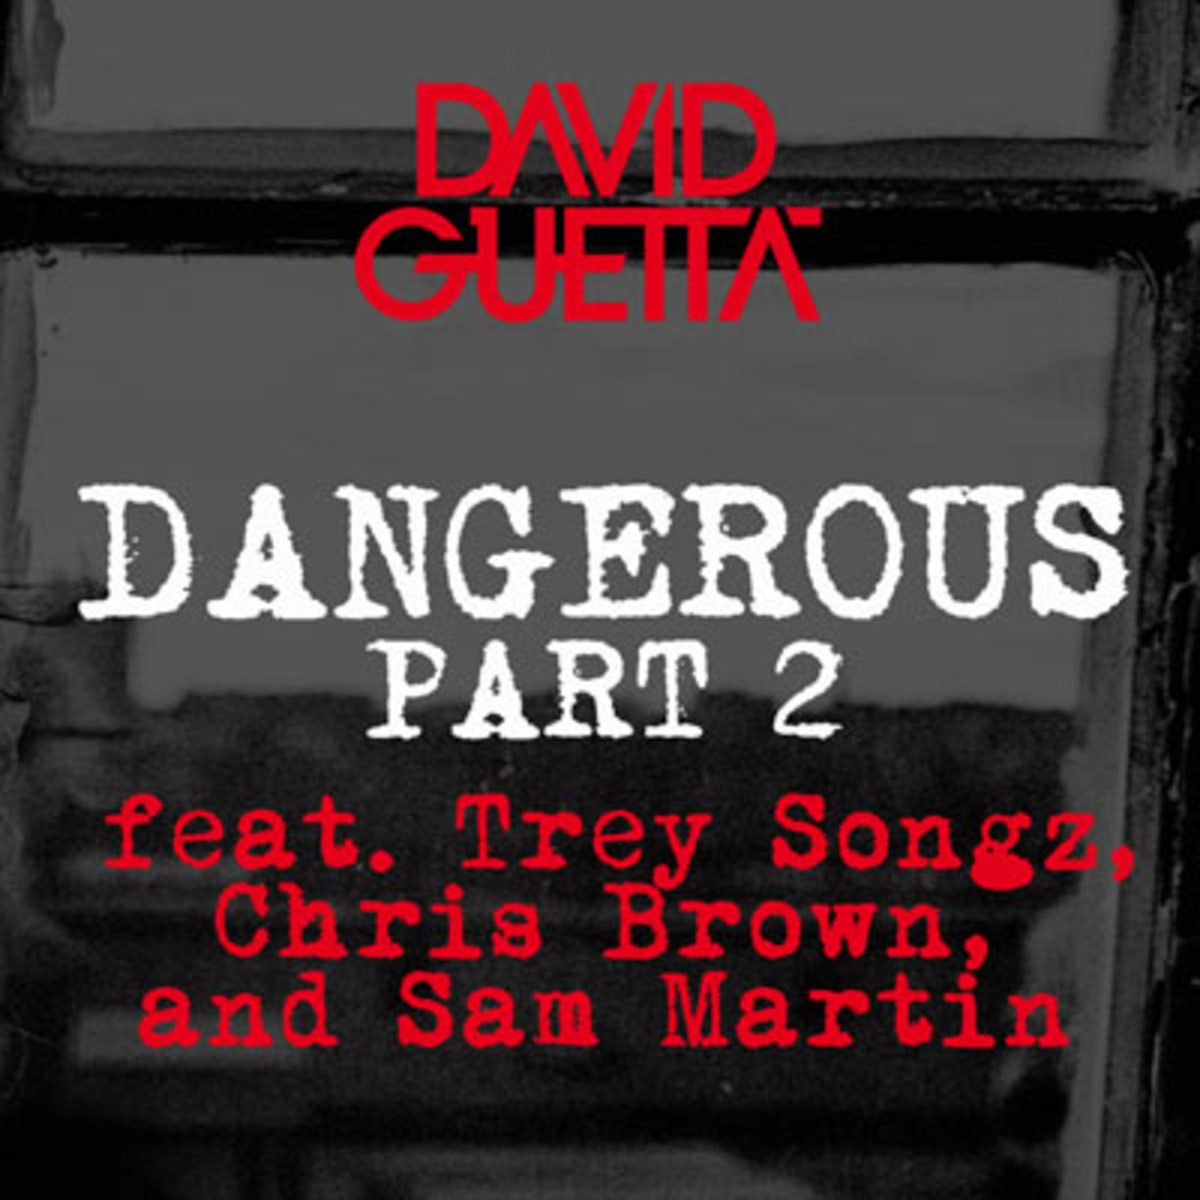 davidguetta-dangerous2.jpg